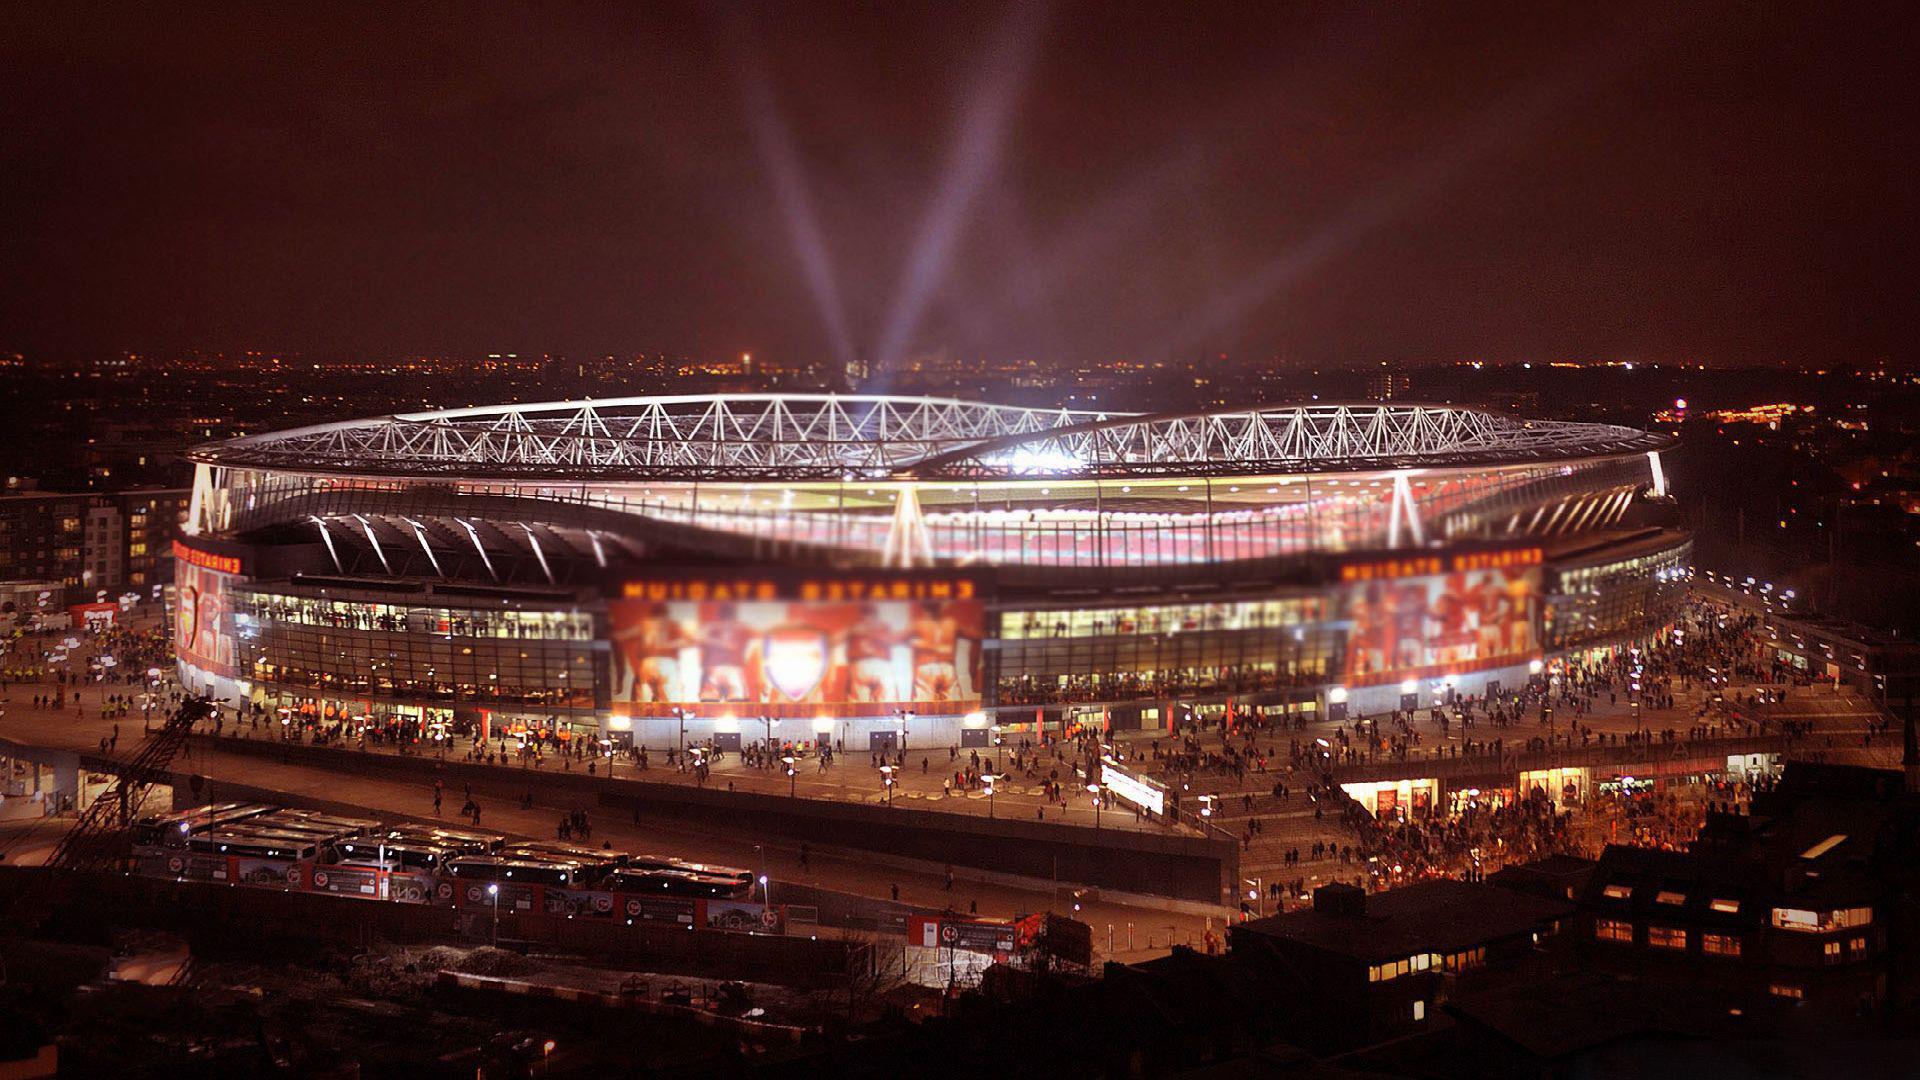 [77+] Emirates Stadium Wallpapers On WallpaperSafari